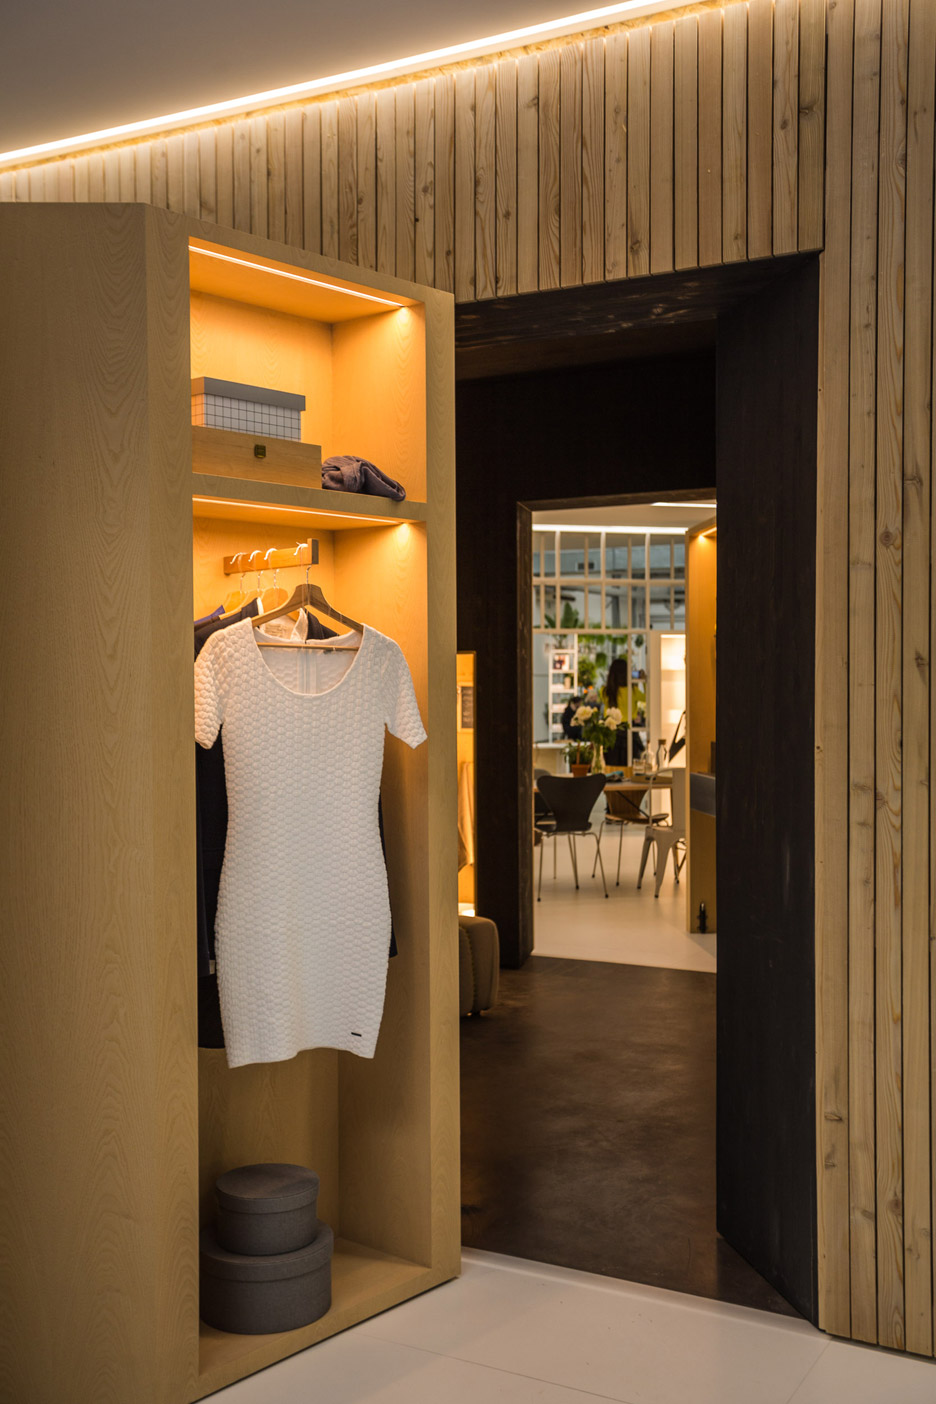 mini-living-installation-milan-design-week-2016_dezeen_936_4-1